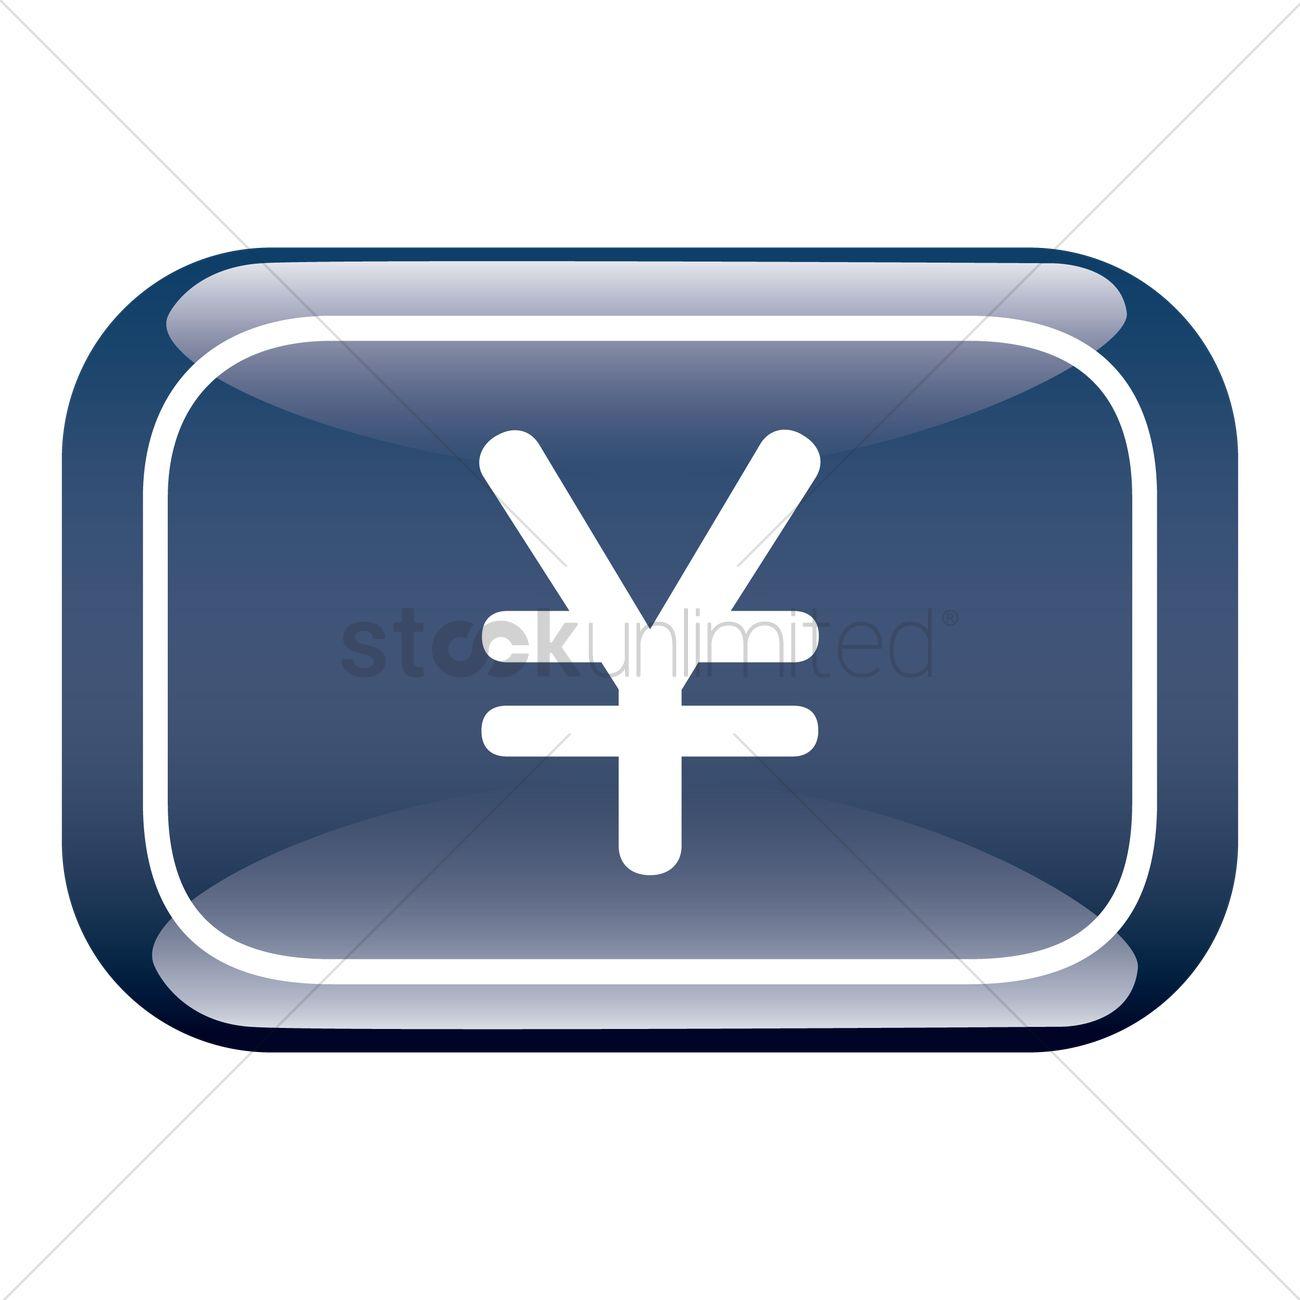 Japan yen currency symbol vector image 1306055 stockunlimited japan yen currency symbol vector graphic biocorpaavc